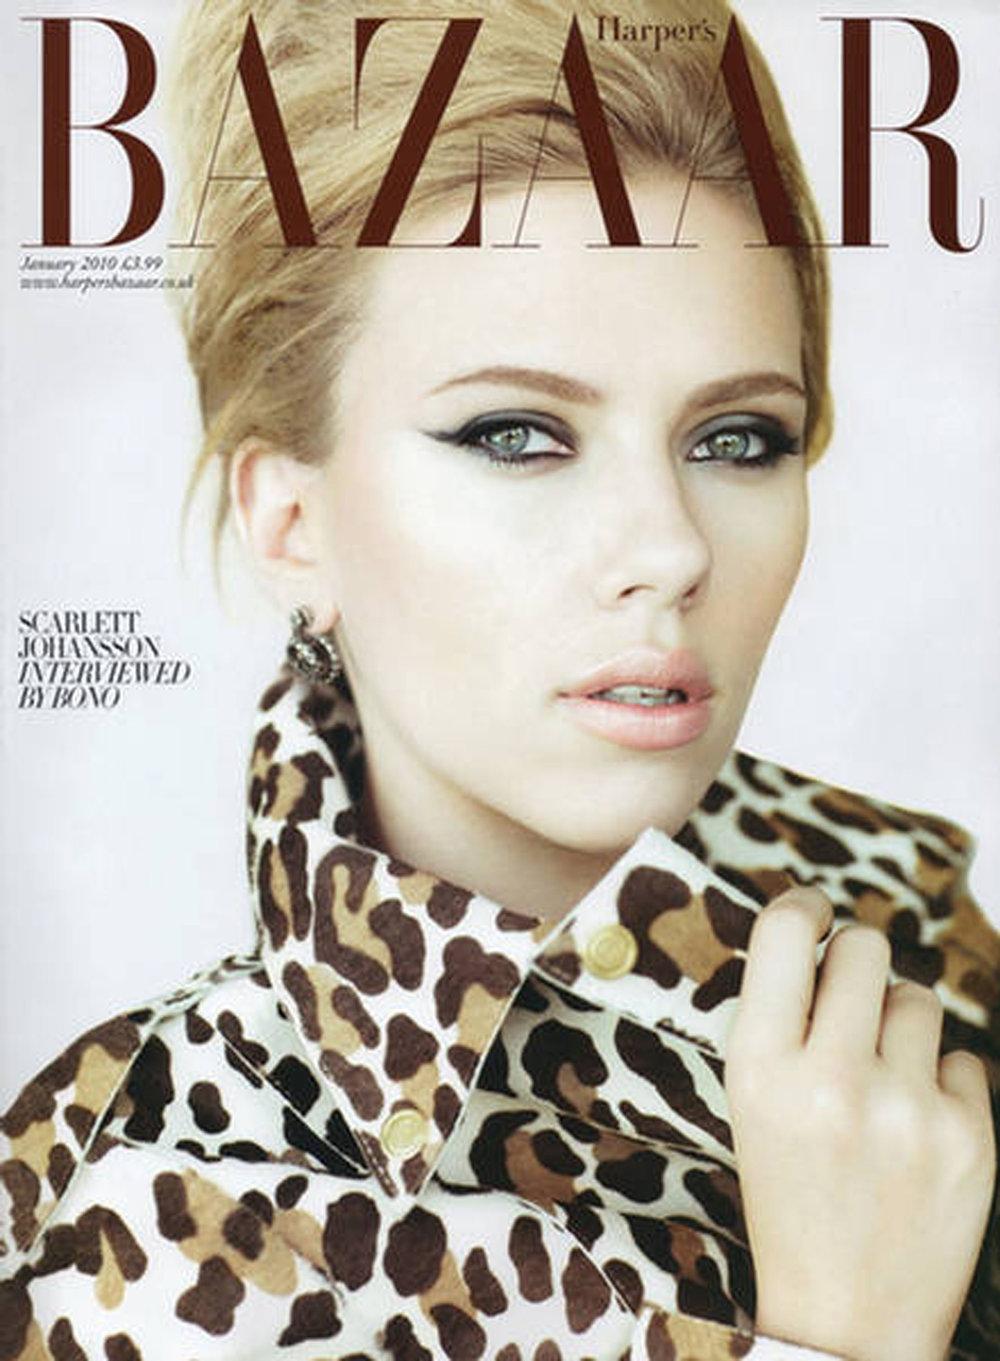 Scarlett-Johansson-Harpers-Bazaar-1.jpg